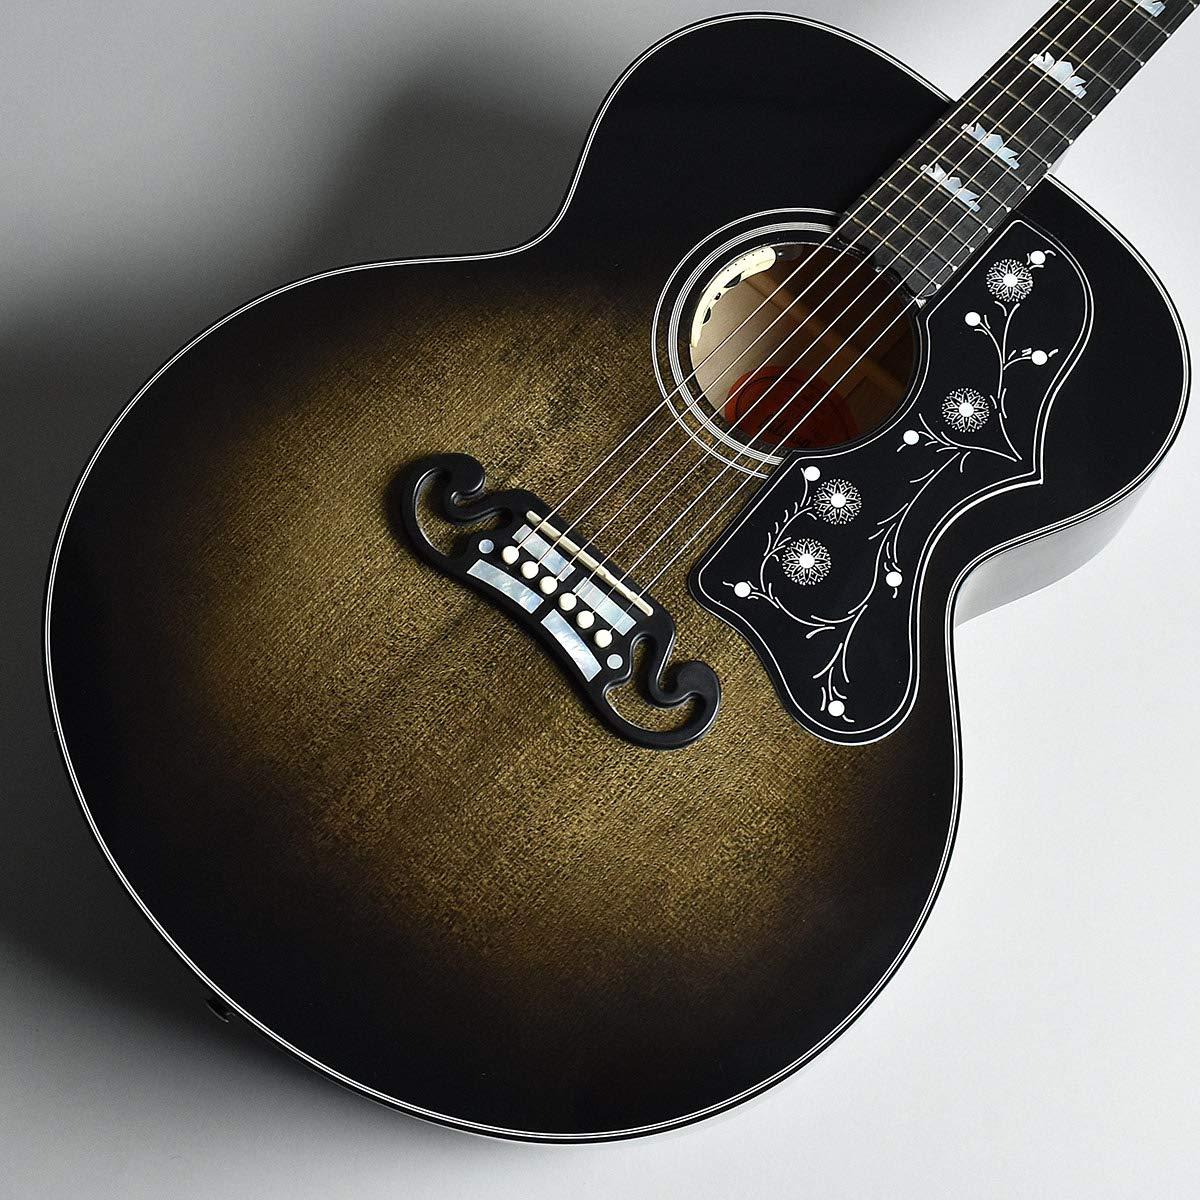 Gibson Custom Shop SJ-200 Snakebite 2018 Limited (s/n:11218027) エレアコギター ギブソン   B07HGXCB45